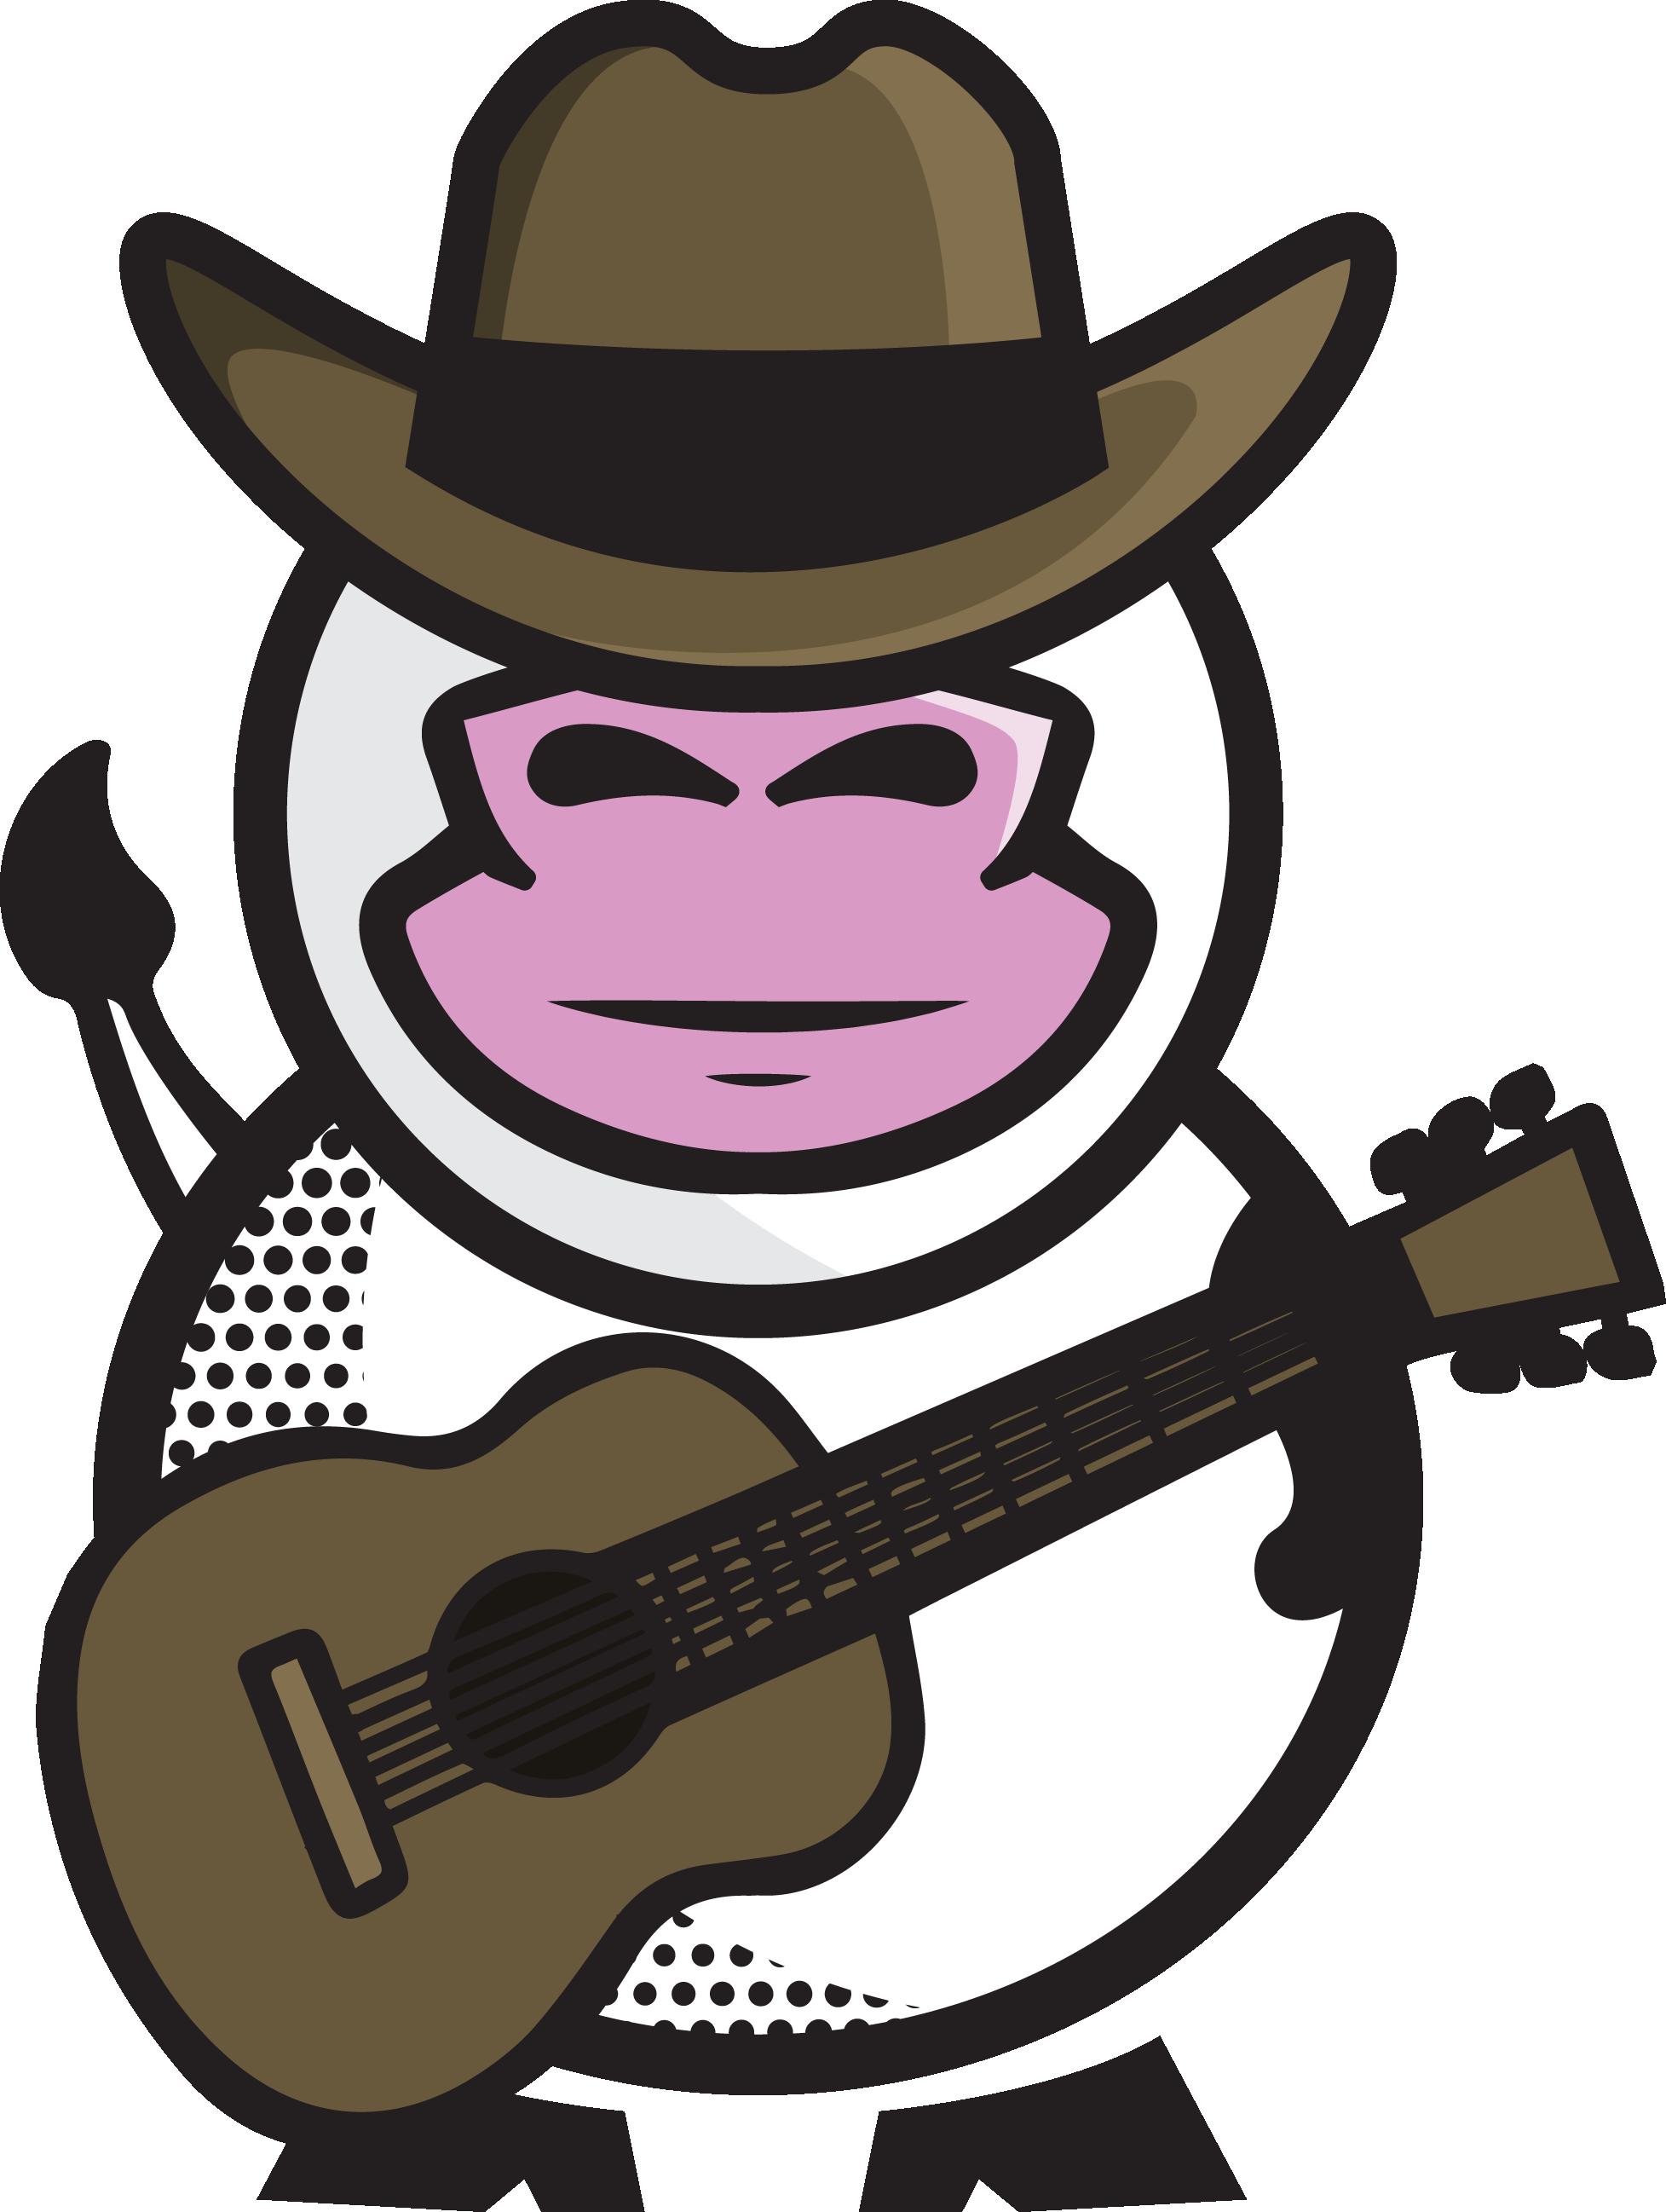 Clipart guitar cowboy hat. Udderly america trumoo